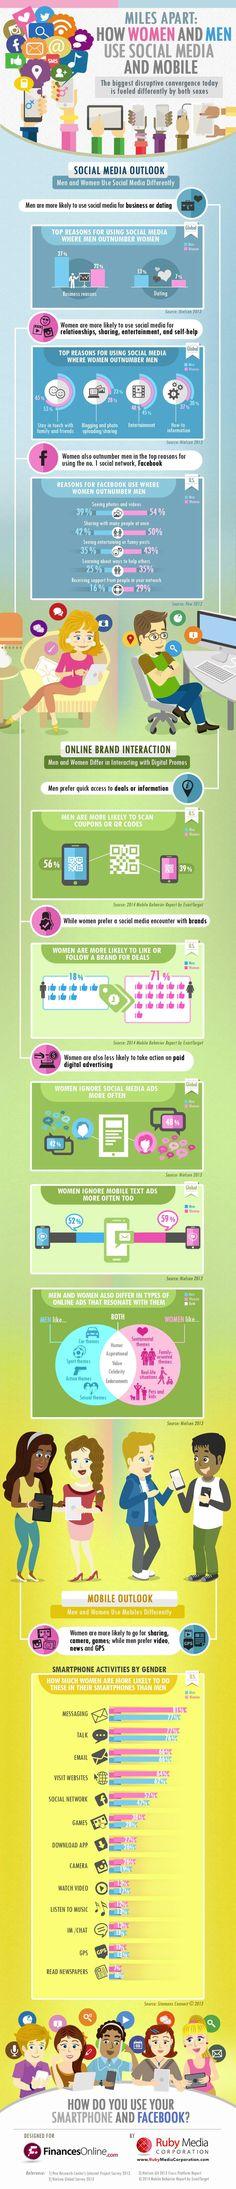 Smartphone and Social Media Usage: Men vs. Women (Infographic)